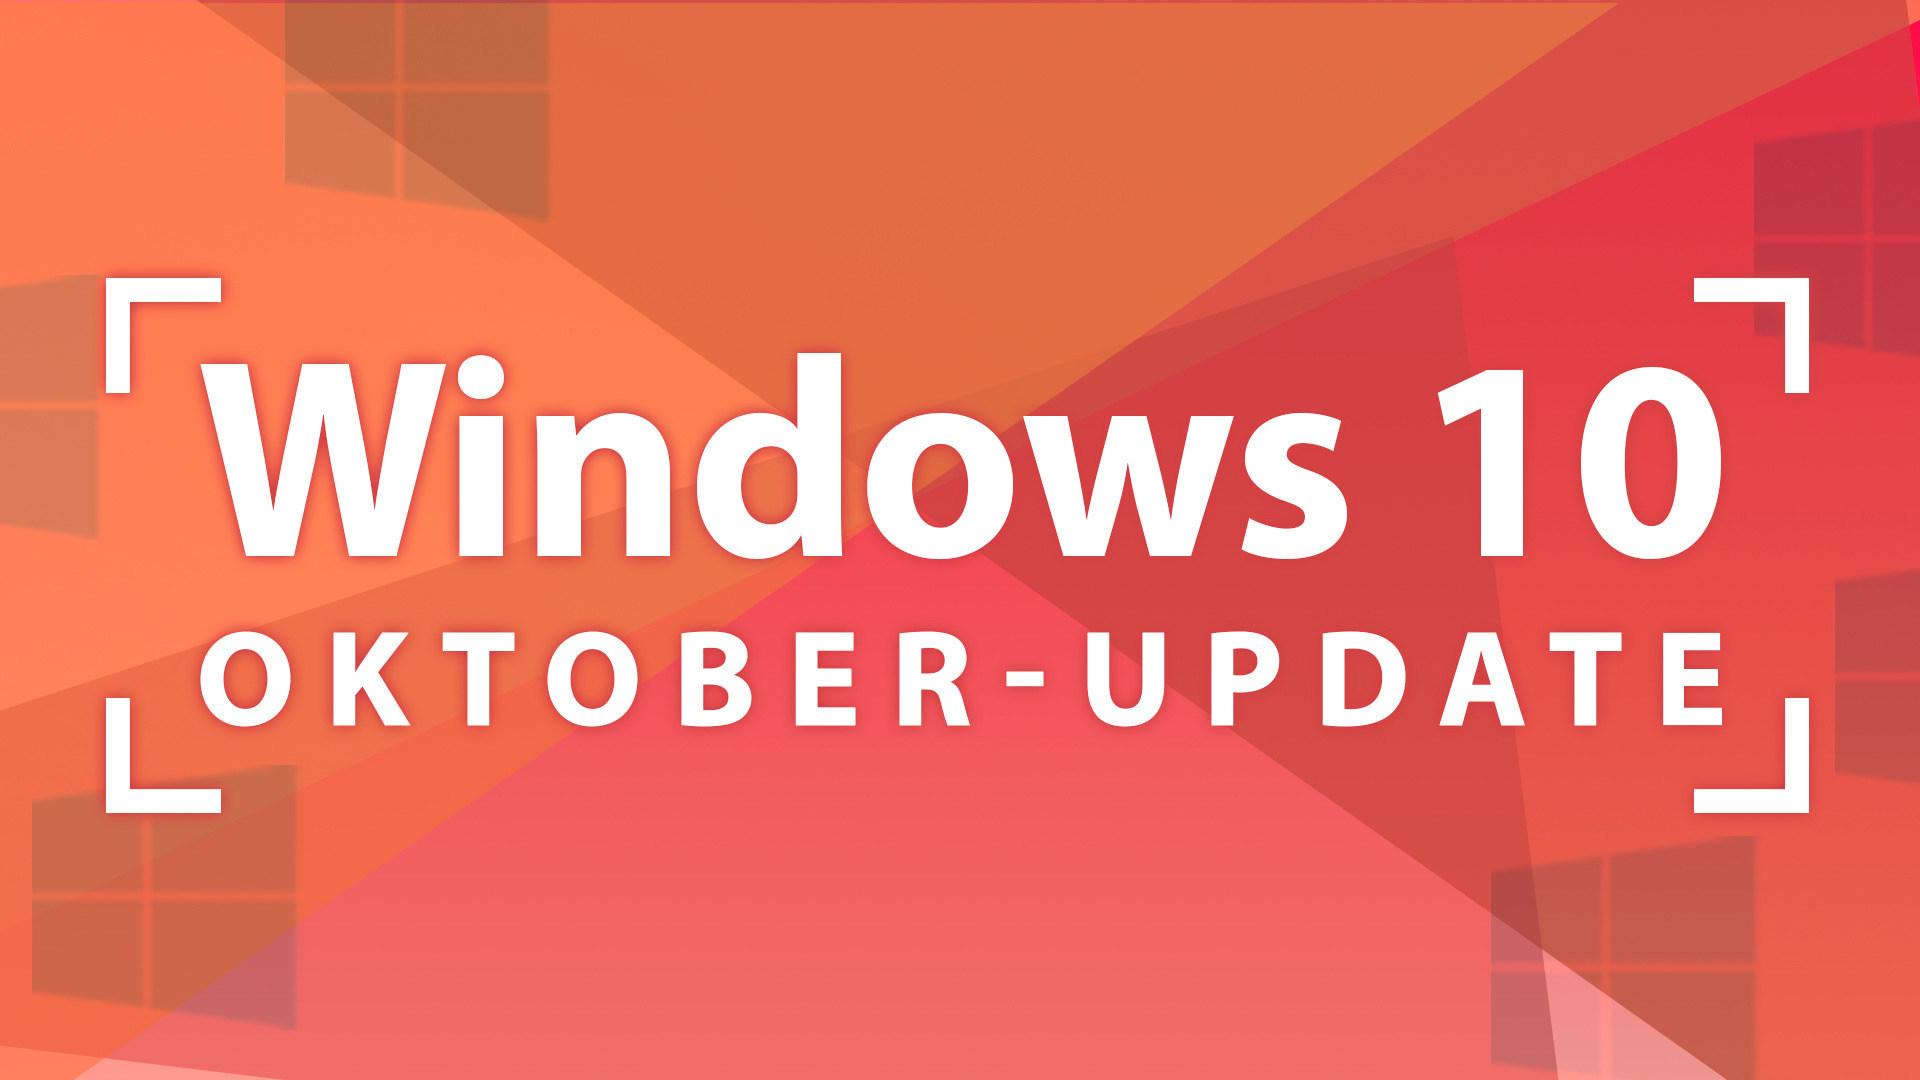 Microsoft, Betriebssystem, Windows 10, Update, 20h2, Windows 10 Oktober Update, Windows 10 Update, Windows 10 Herbst Update, Herbst, Windows 10 20H2, Windows 10 Fall Update, Herbst Update, Windows 10 Oktober 2020 Update, Windows 10 20H2 Update, Windows 10 Oktober 2020